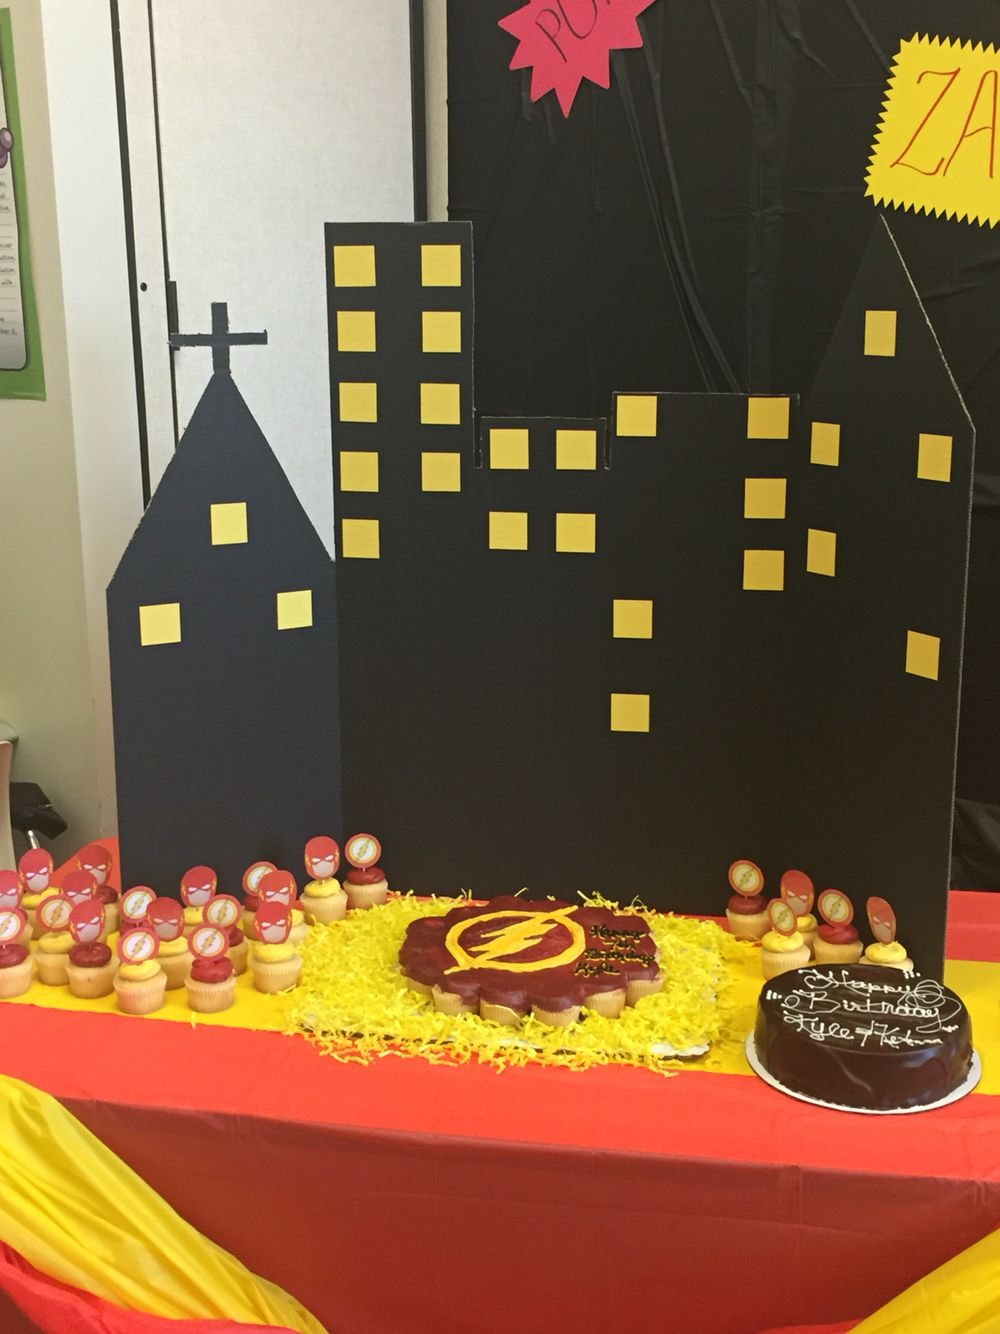 My Own Diy Flash Party Theme Batman Birthday Party 18th Party